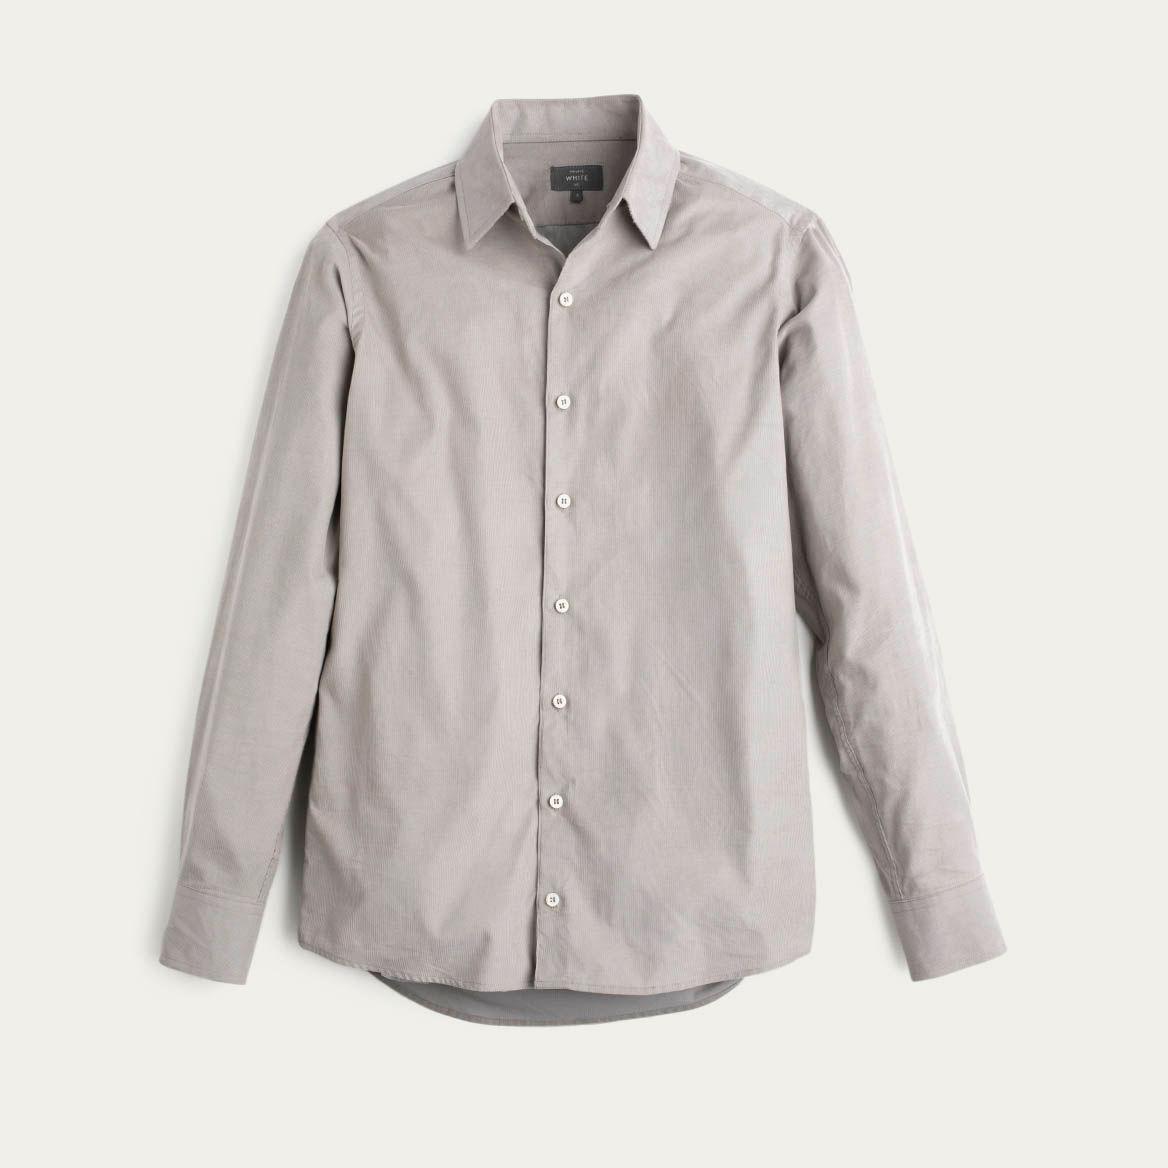 Mushroom Cord Plain Collar Shirt 0